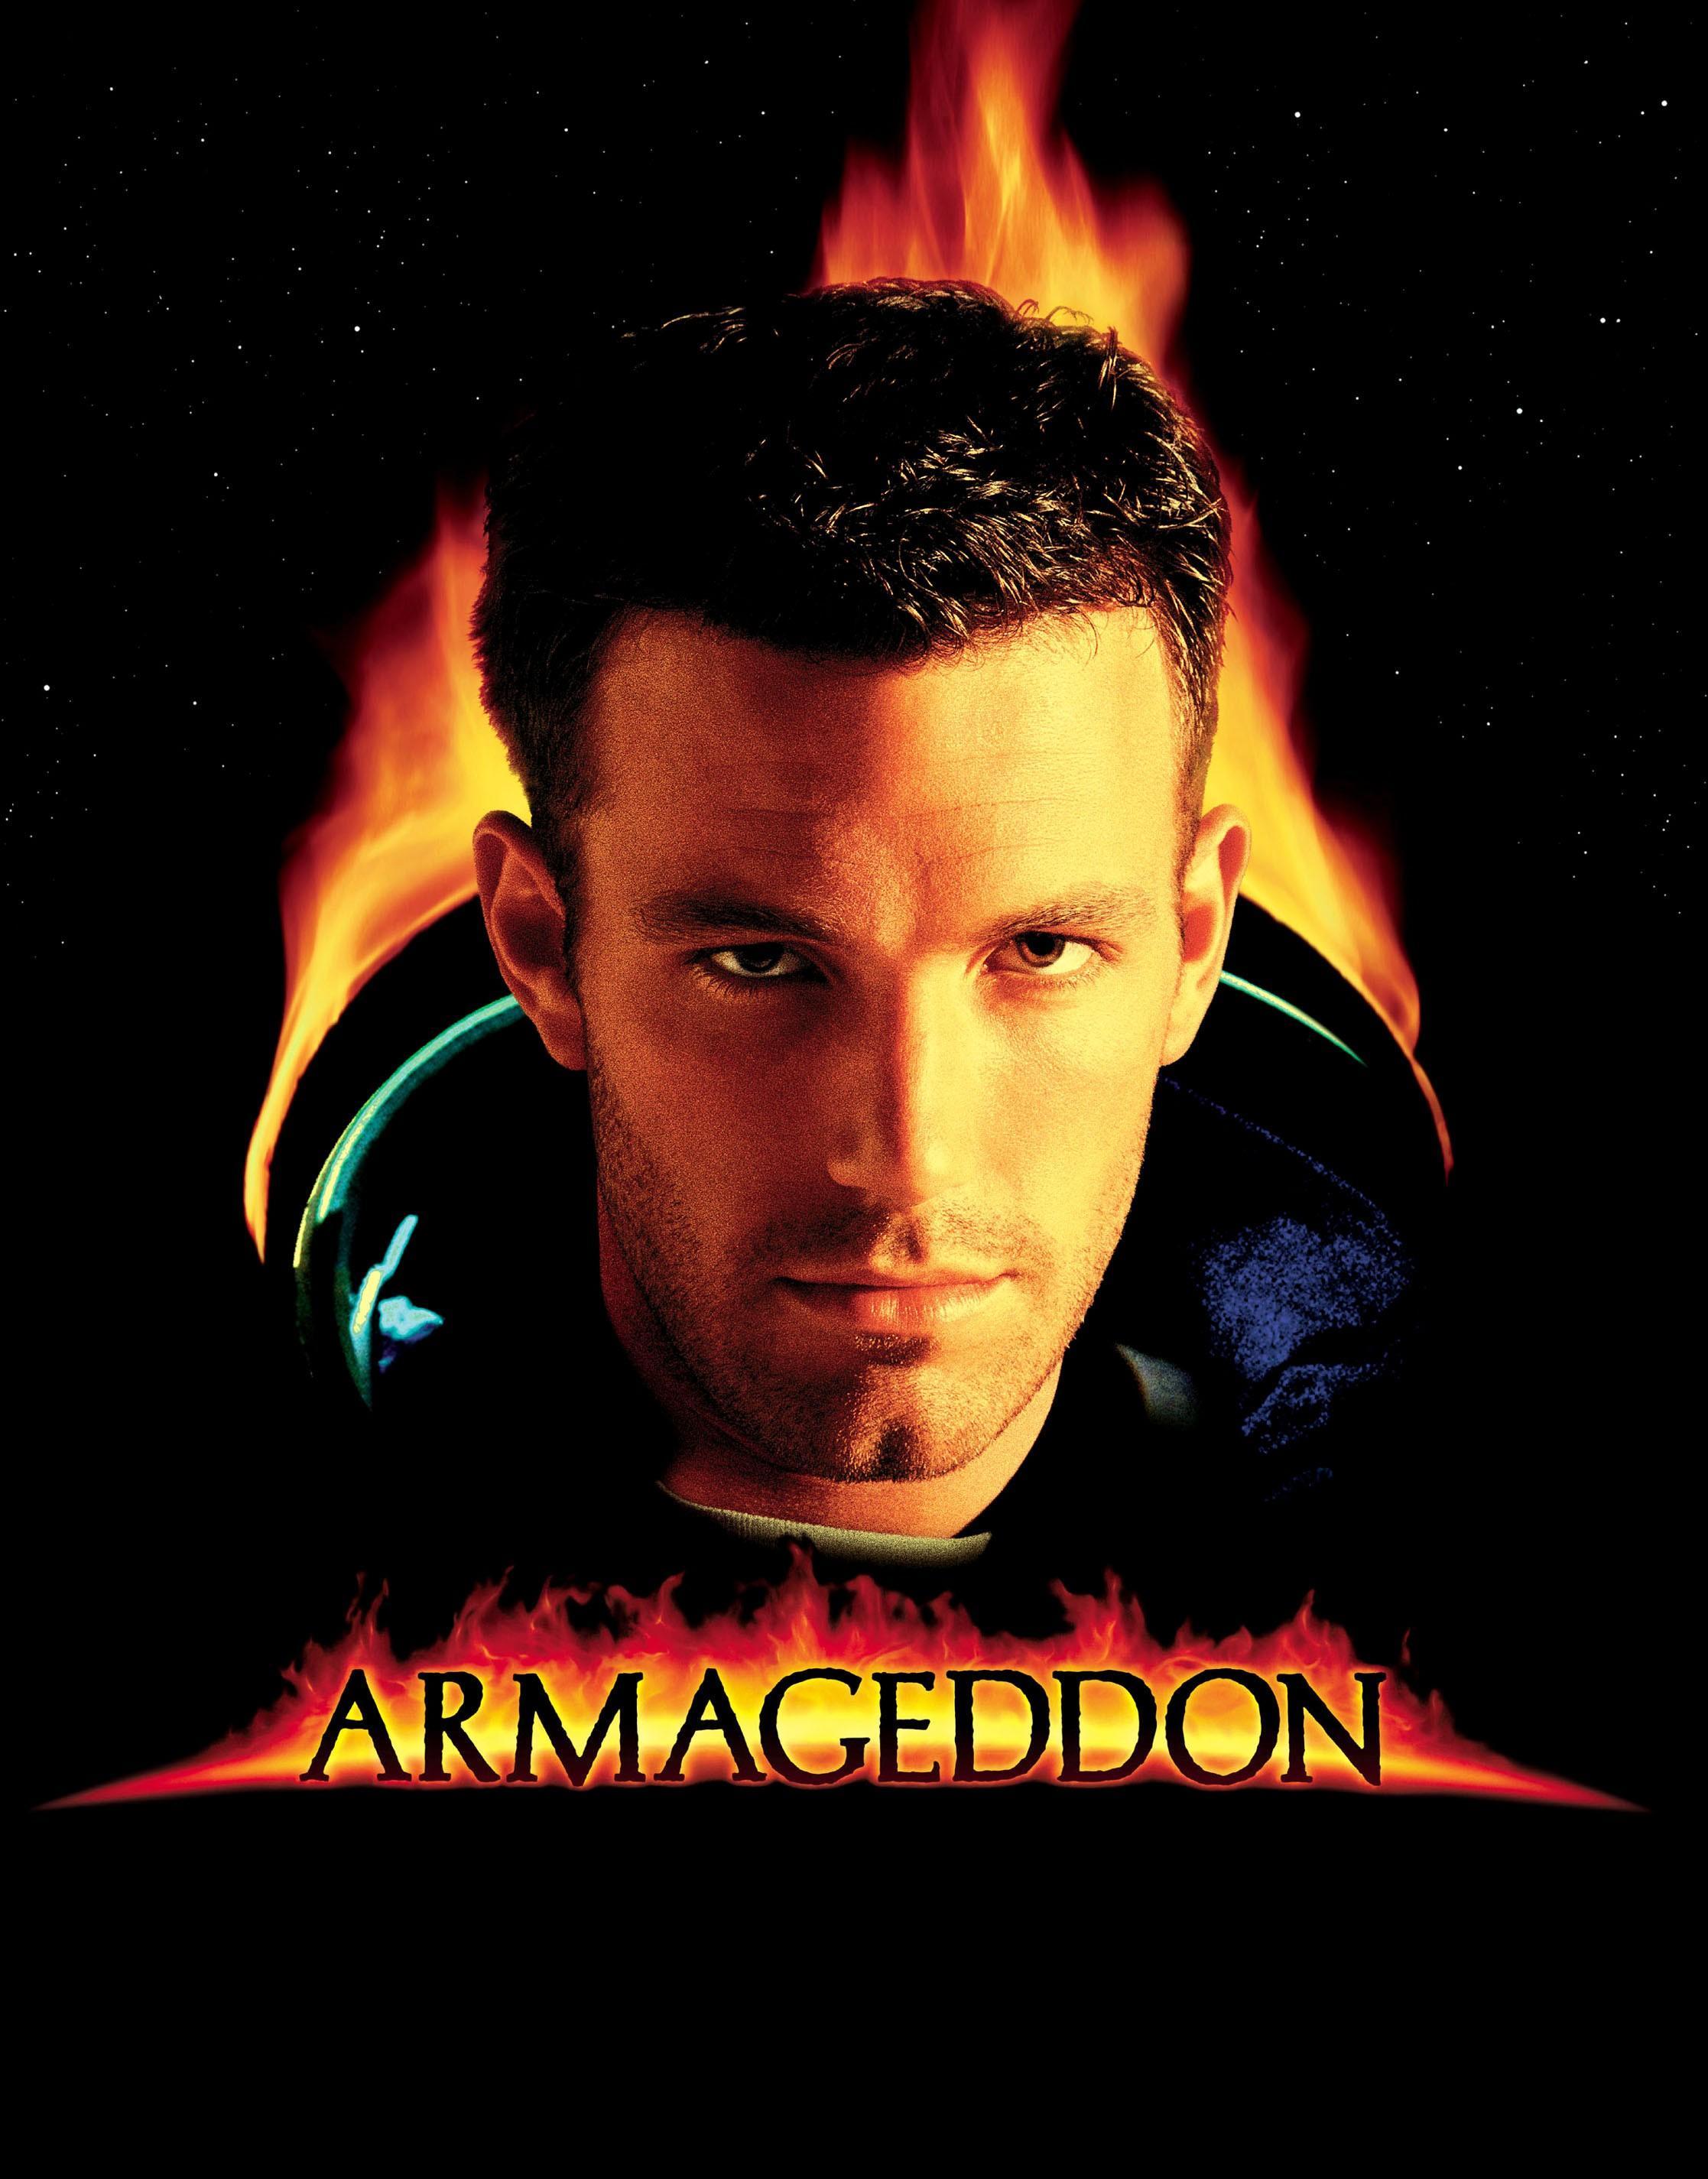 armageddon movie poster - 792×1000